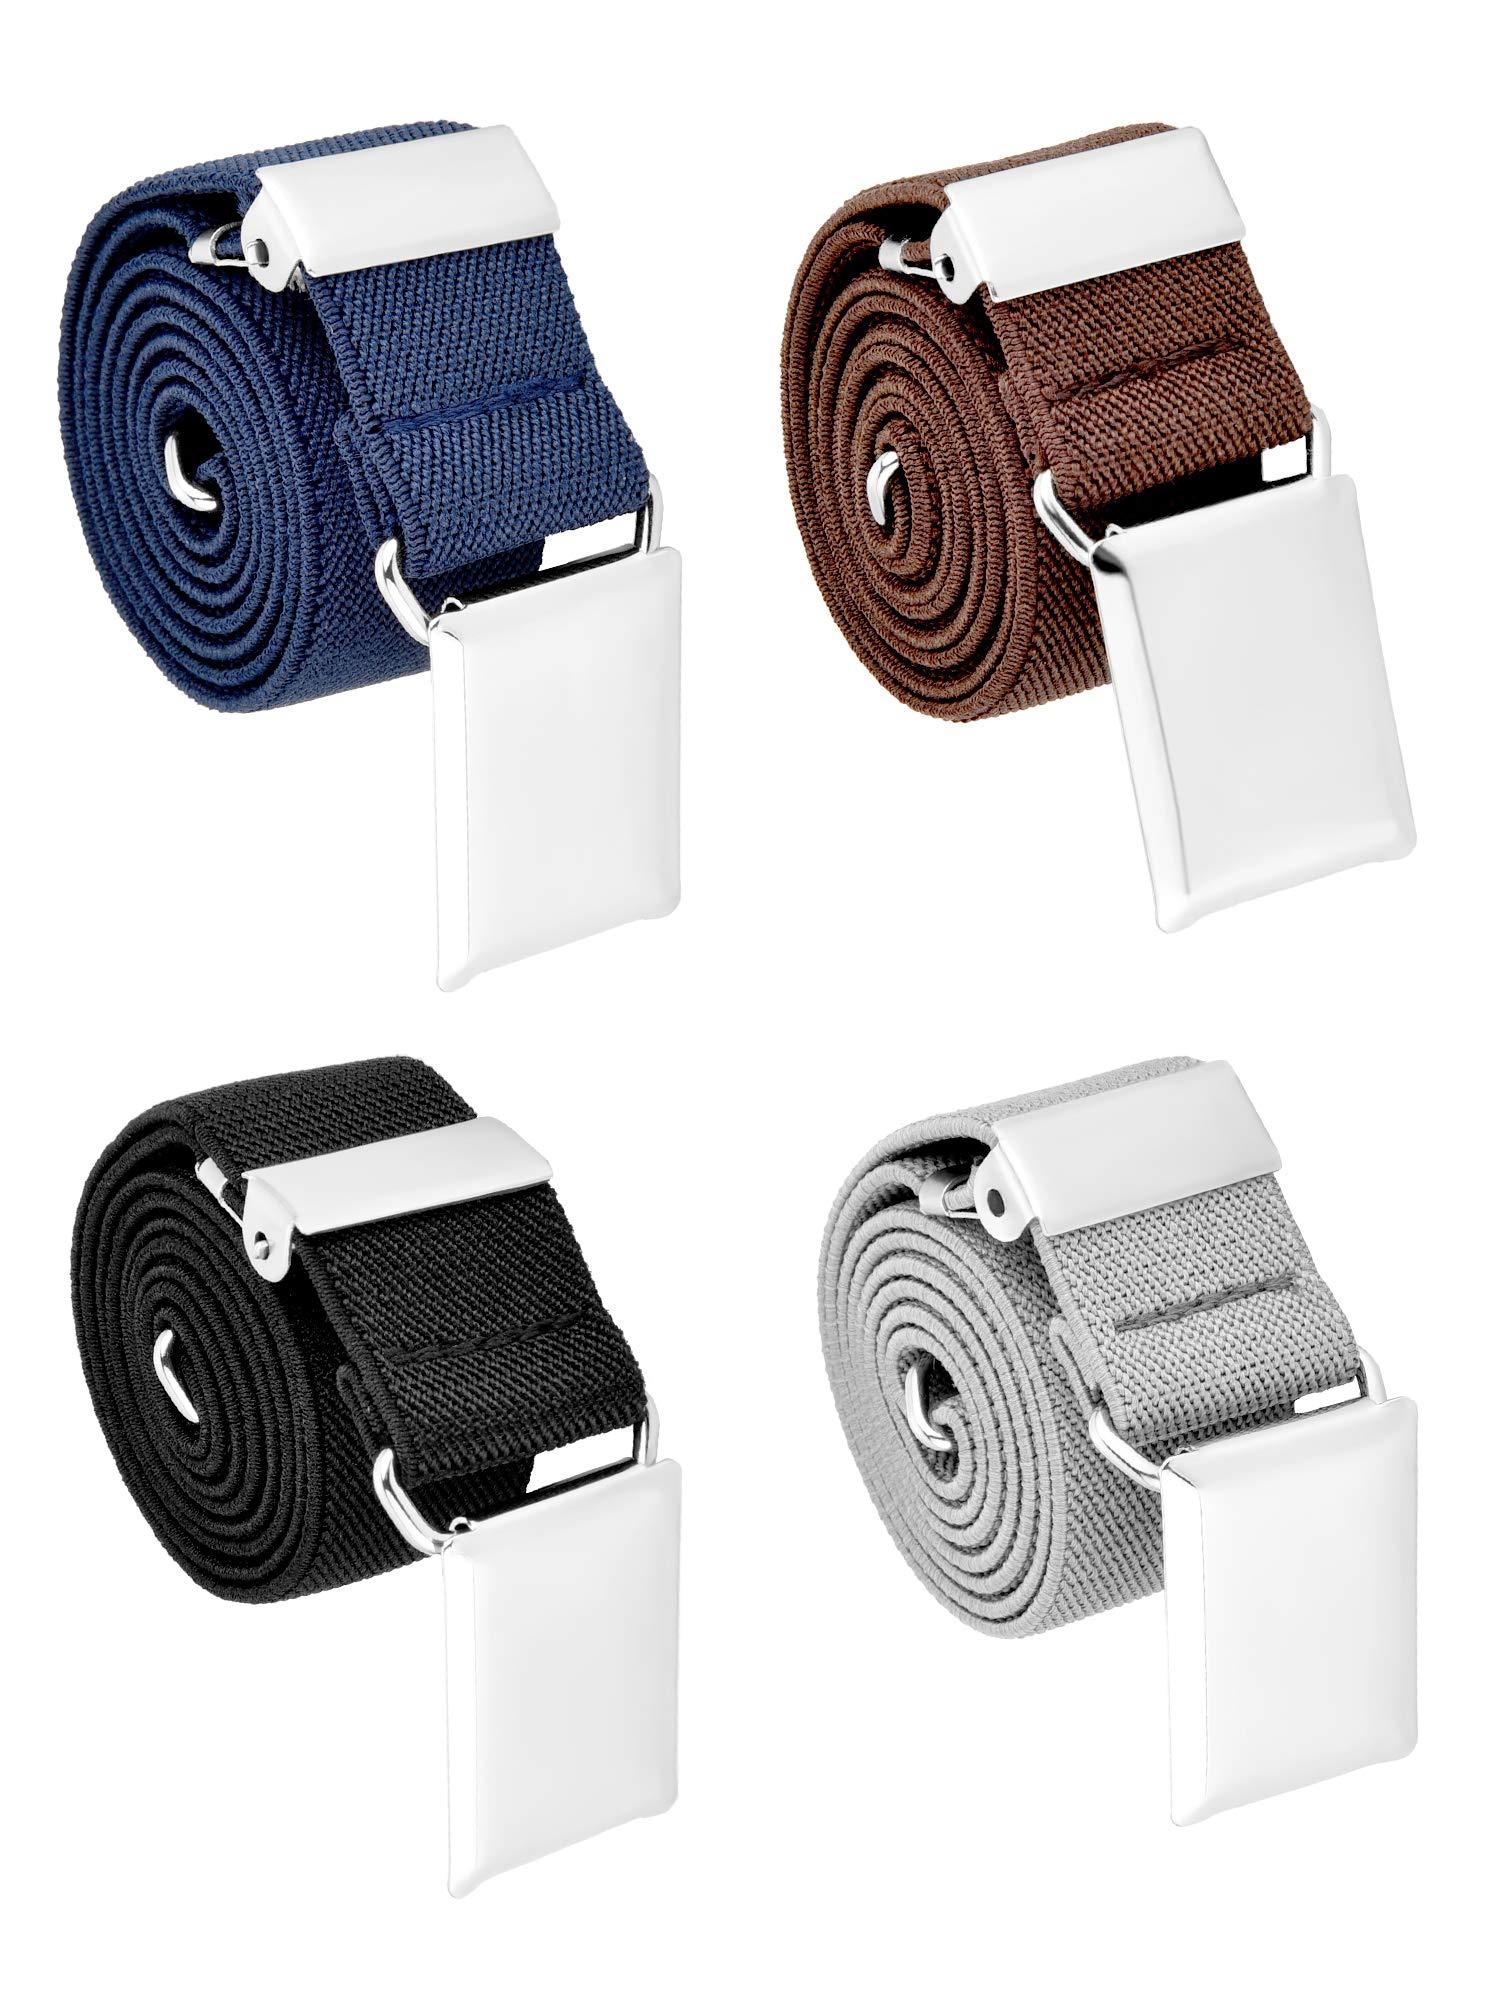 Tatuo 4 Pieces Kids Buckle Belt Kid Adjustable Elastic Belt Boy Stretch Belt for Children Favor (black, gray, brown, navy blue) by Tatuo (Image #4)